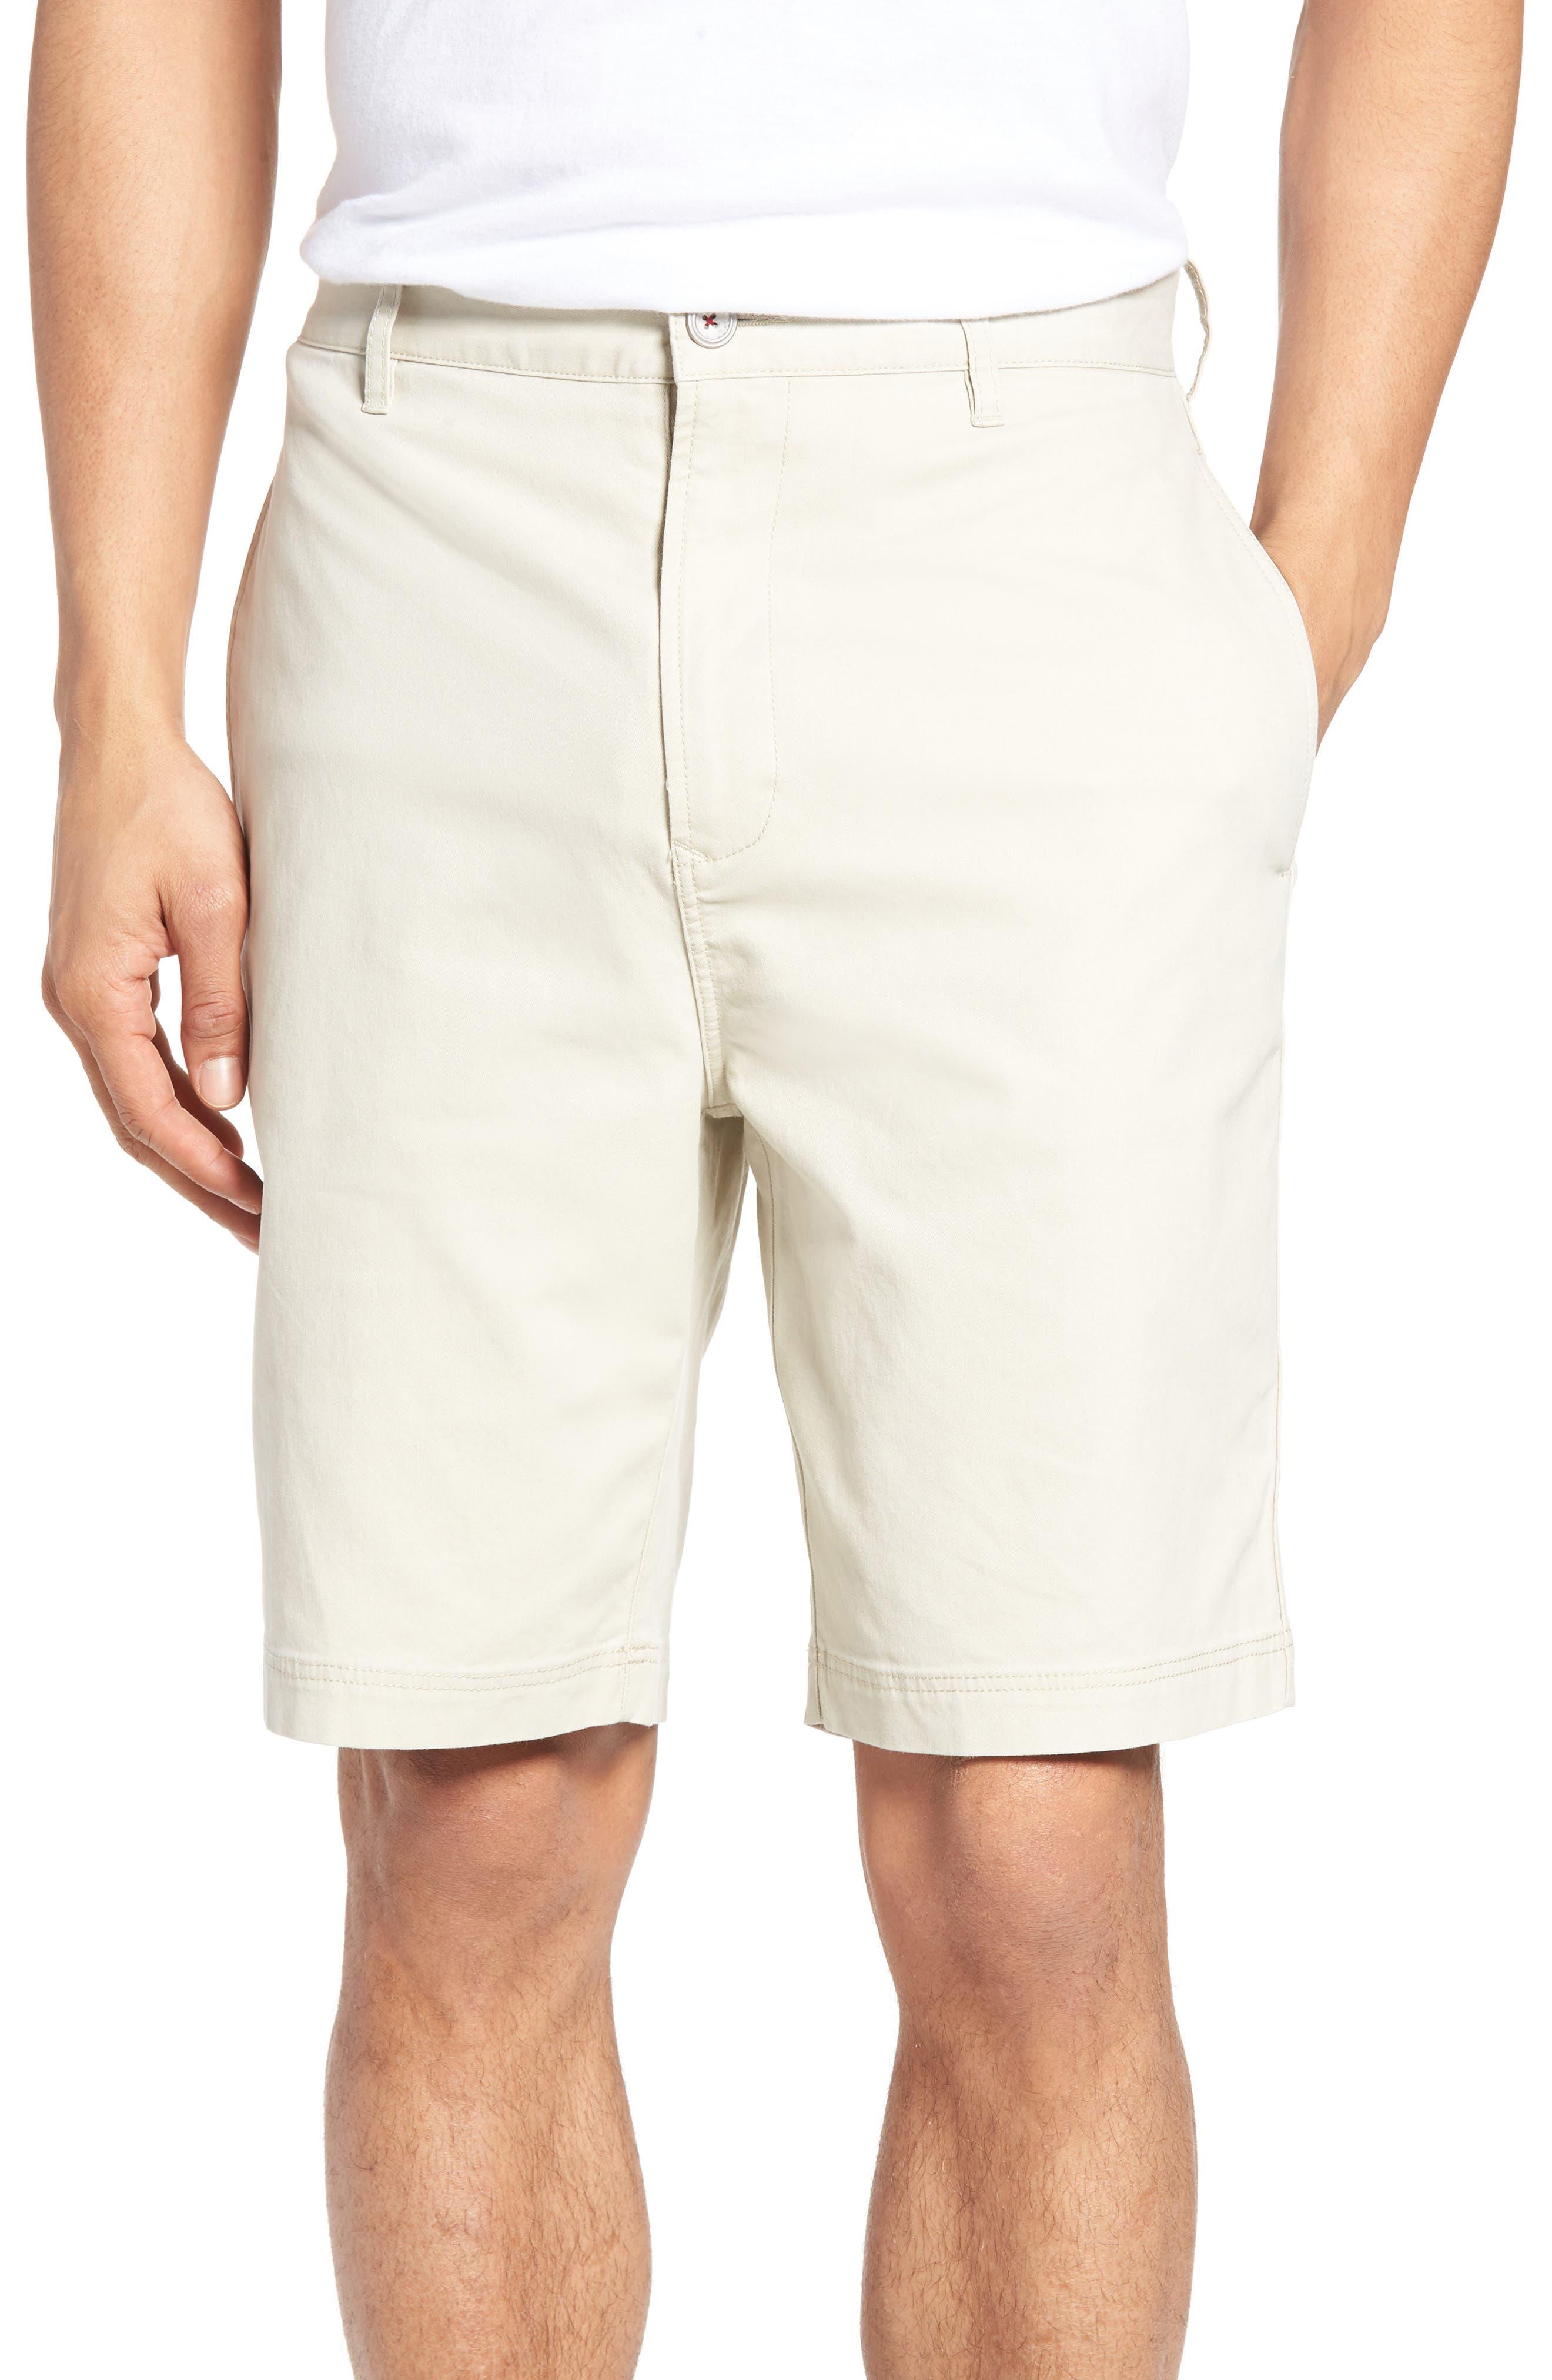 Rodd & Gunn Glenburn Shorts